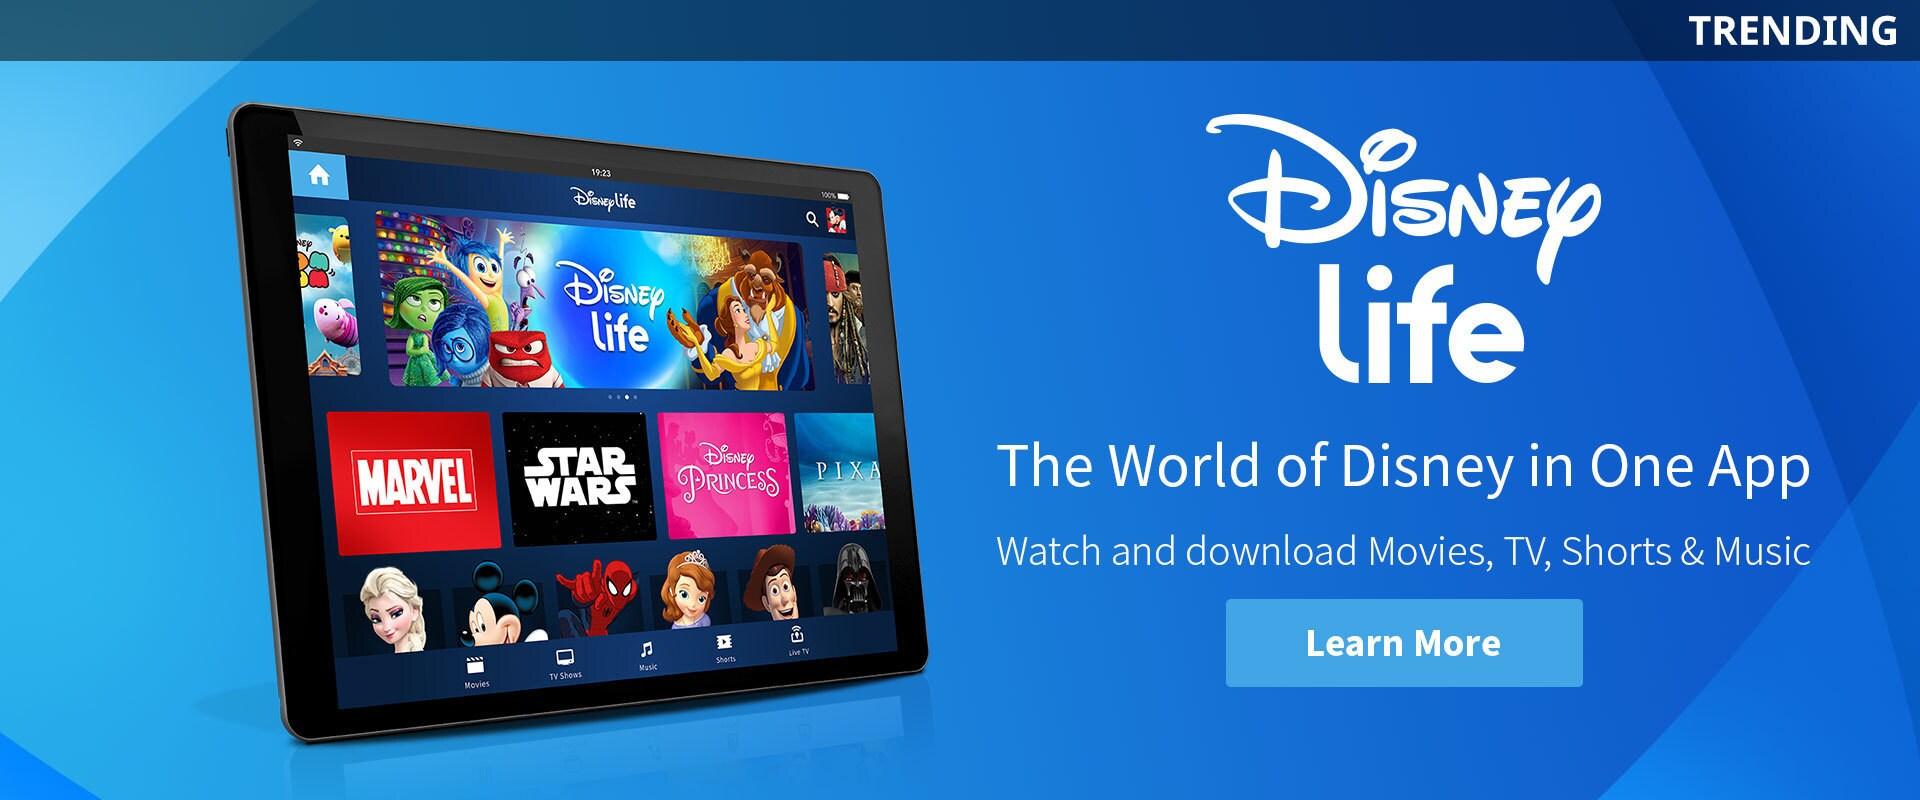 Disney Life HERO Banner - Trending